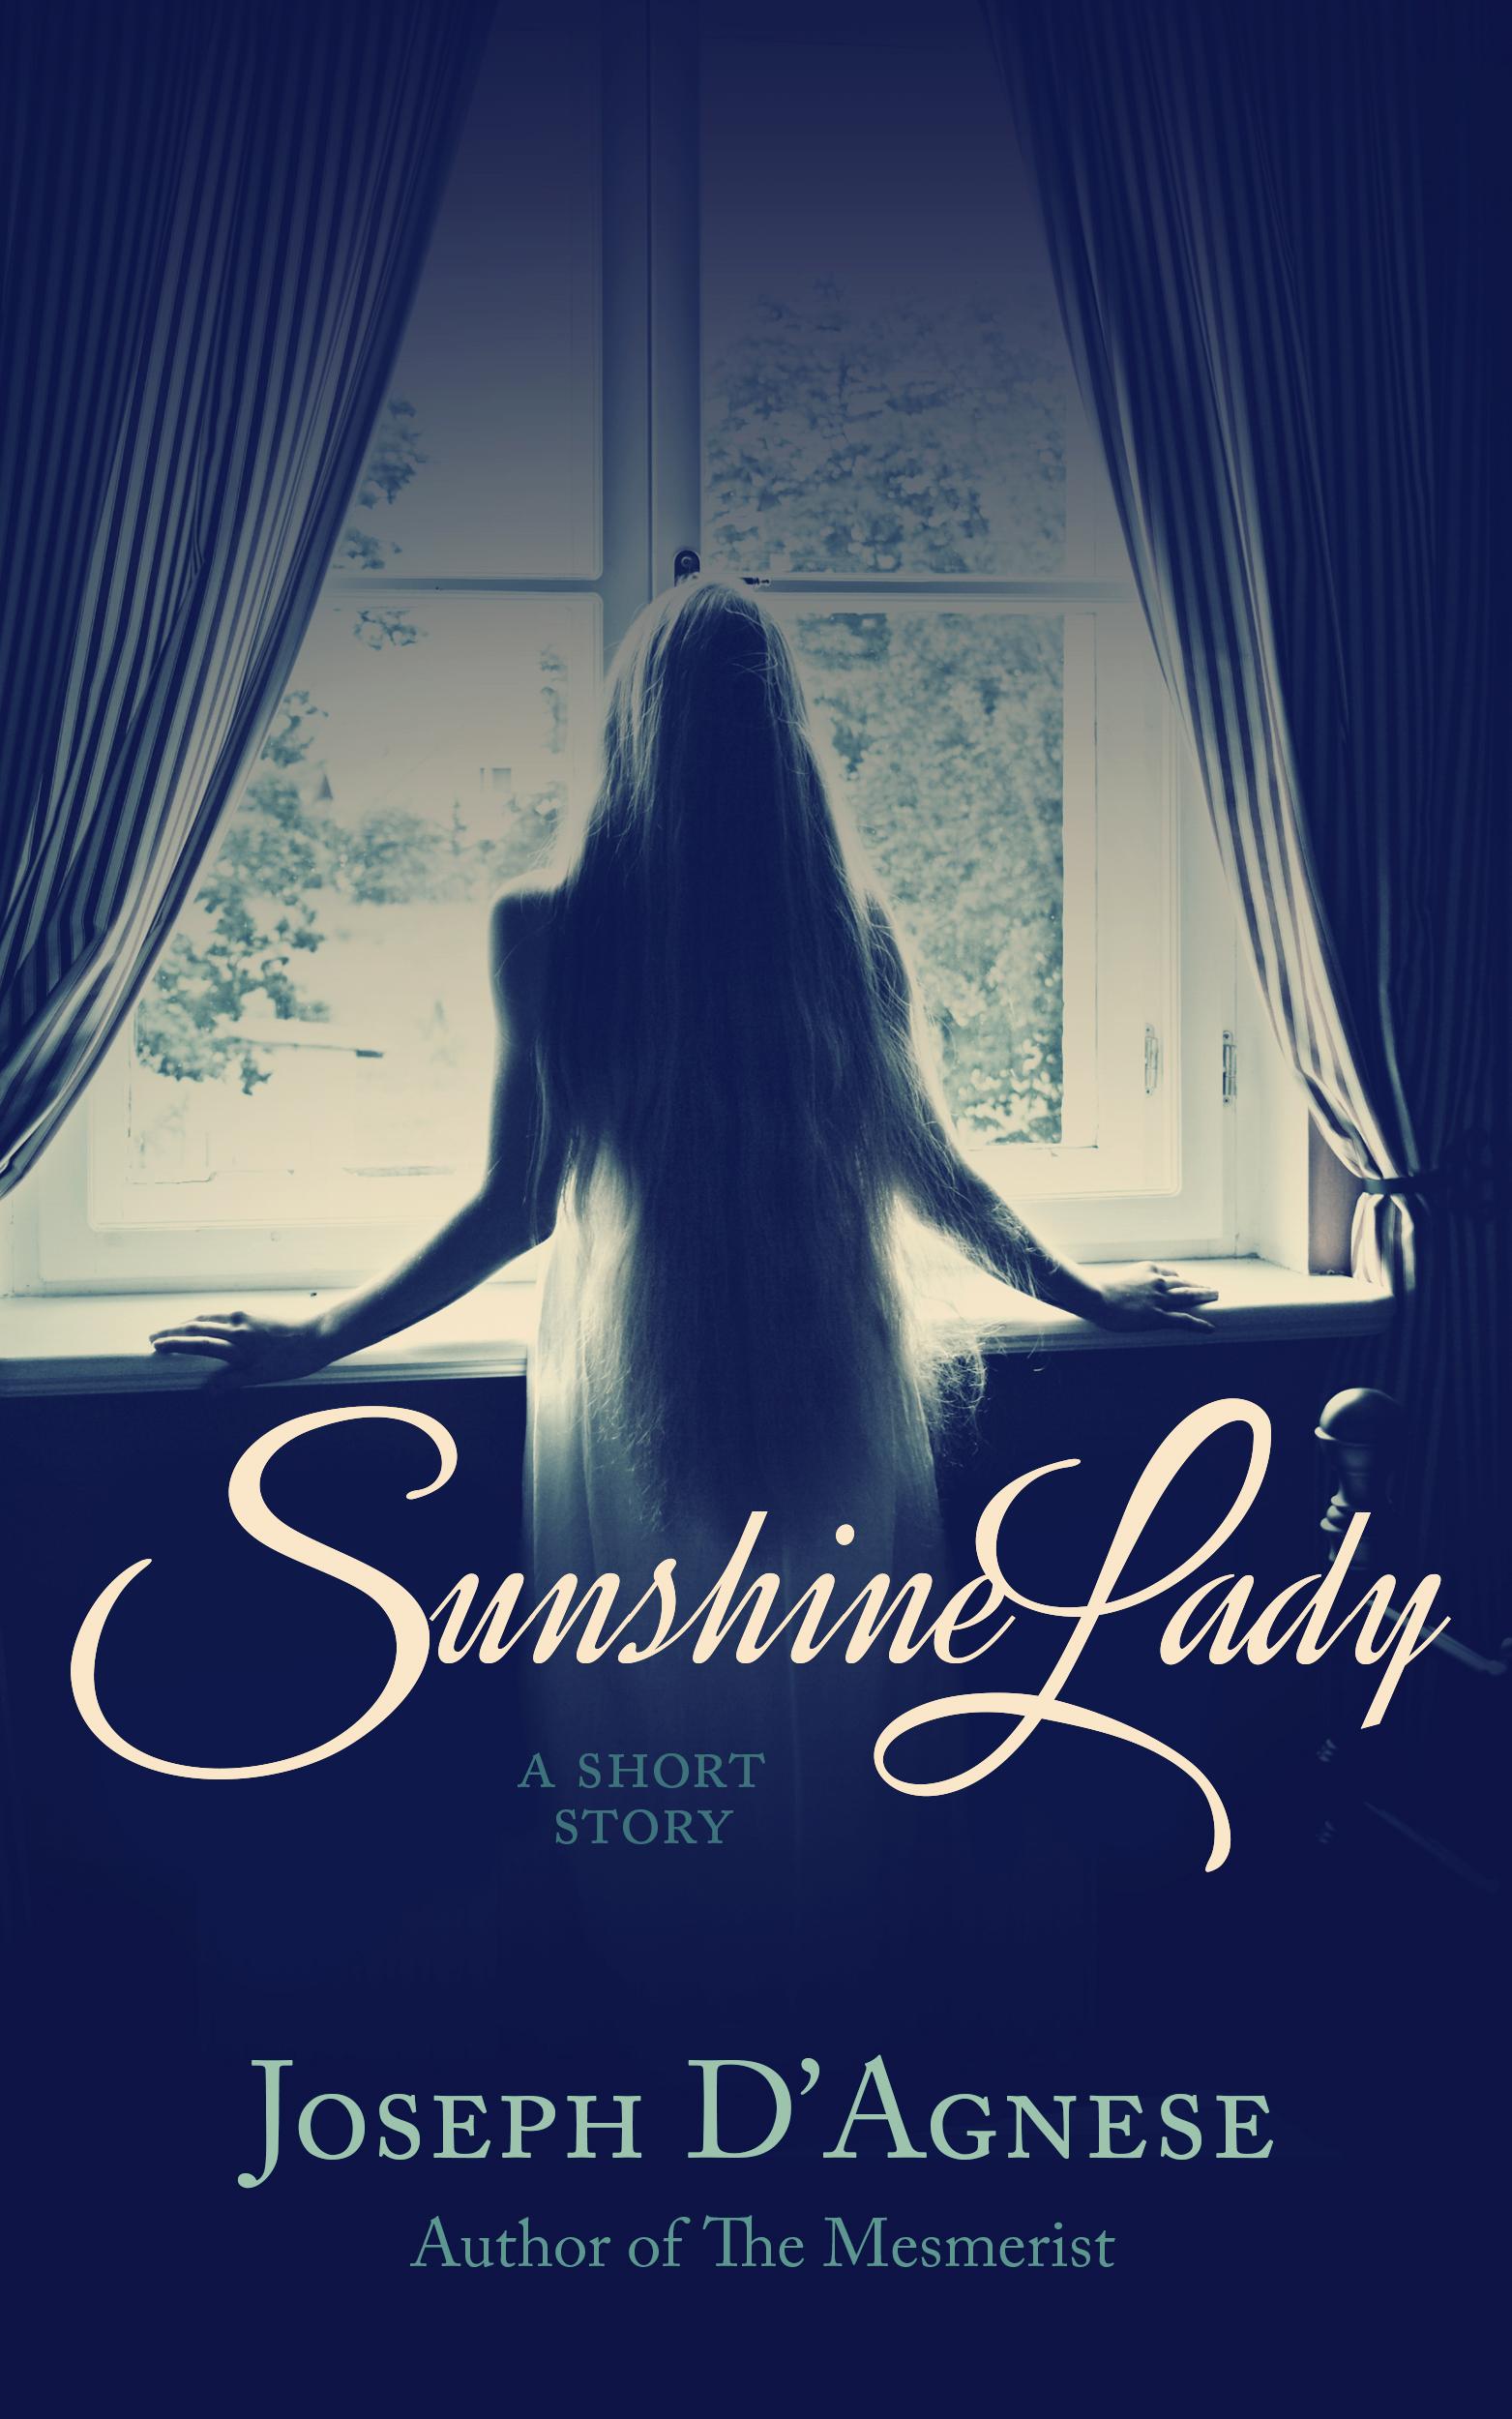 Sunshine Lady by Joseph D'Agnese